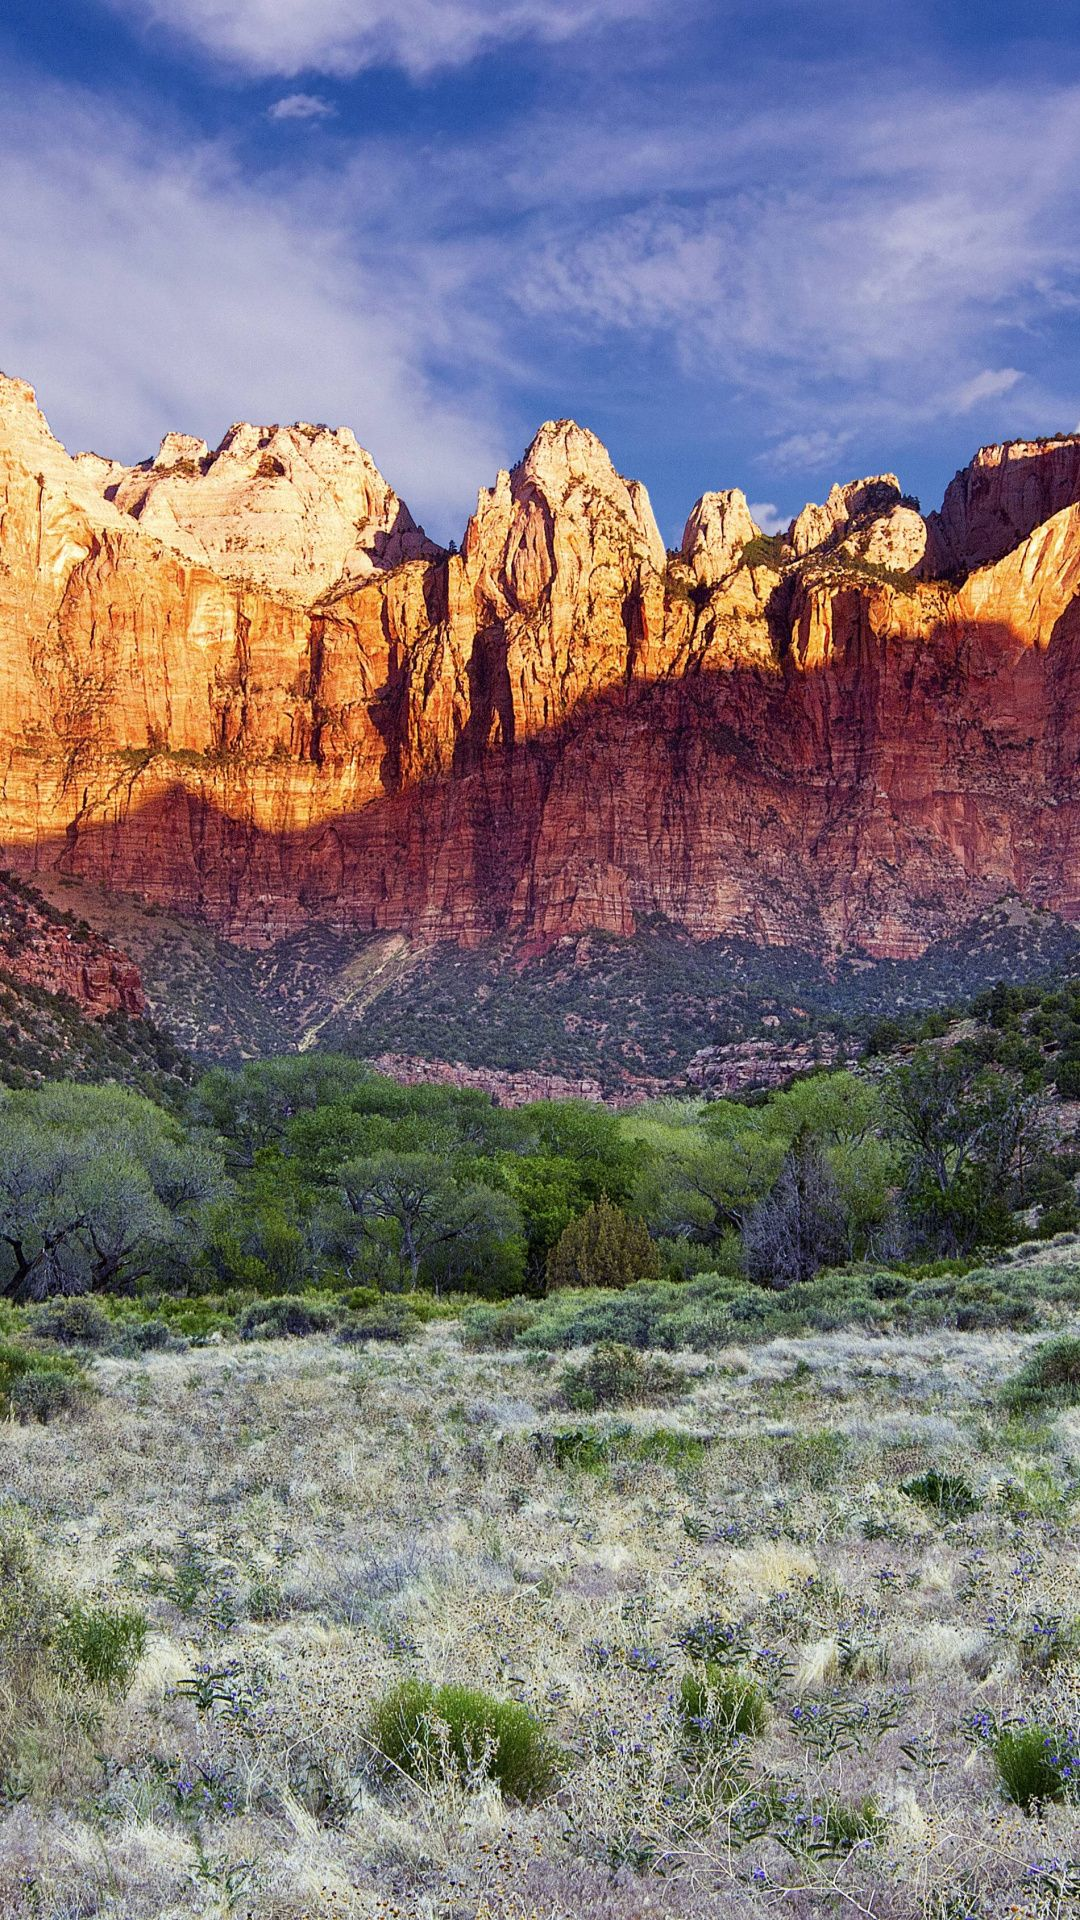 Share Zion National Park Narrow Passage The Canyon Desert